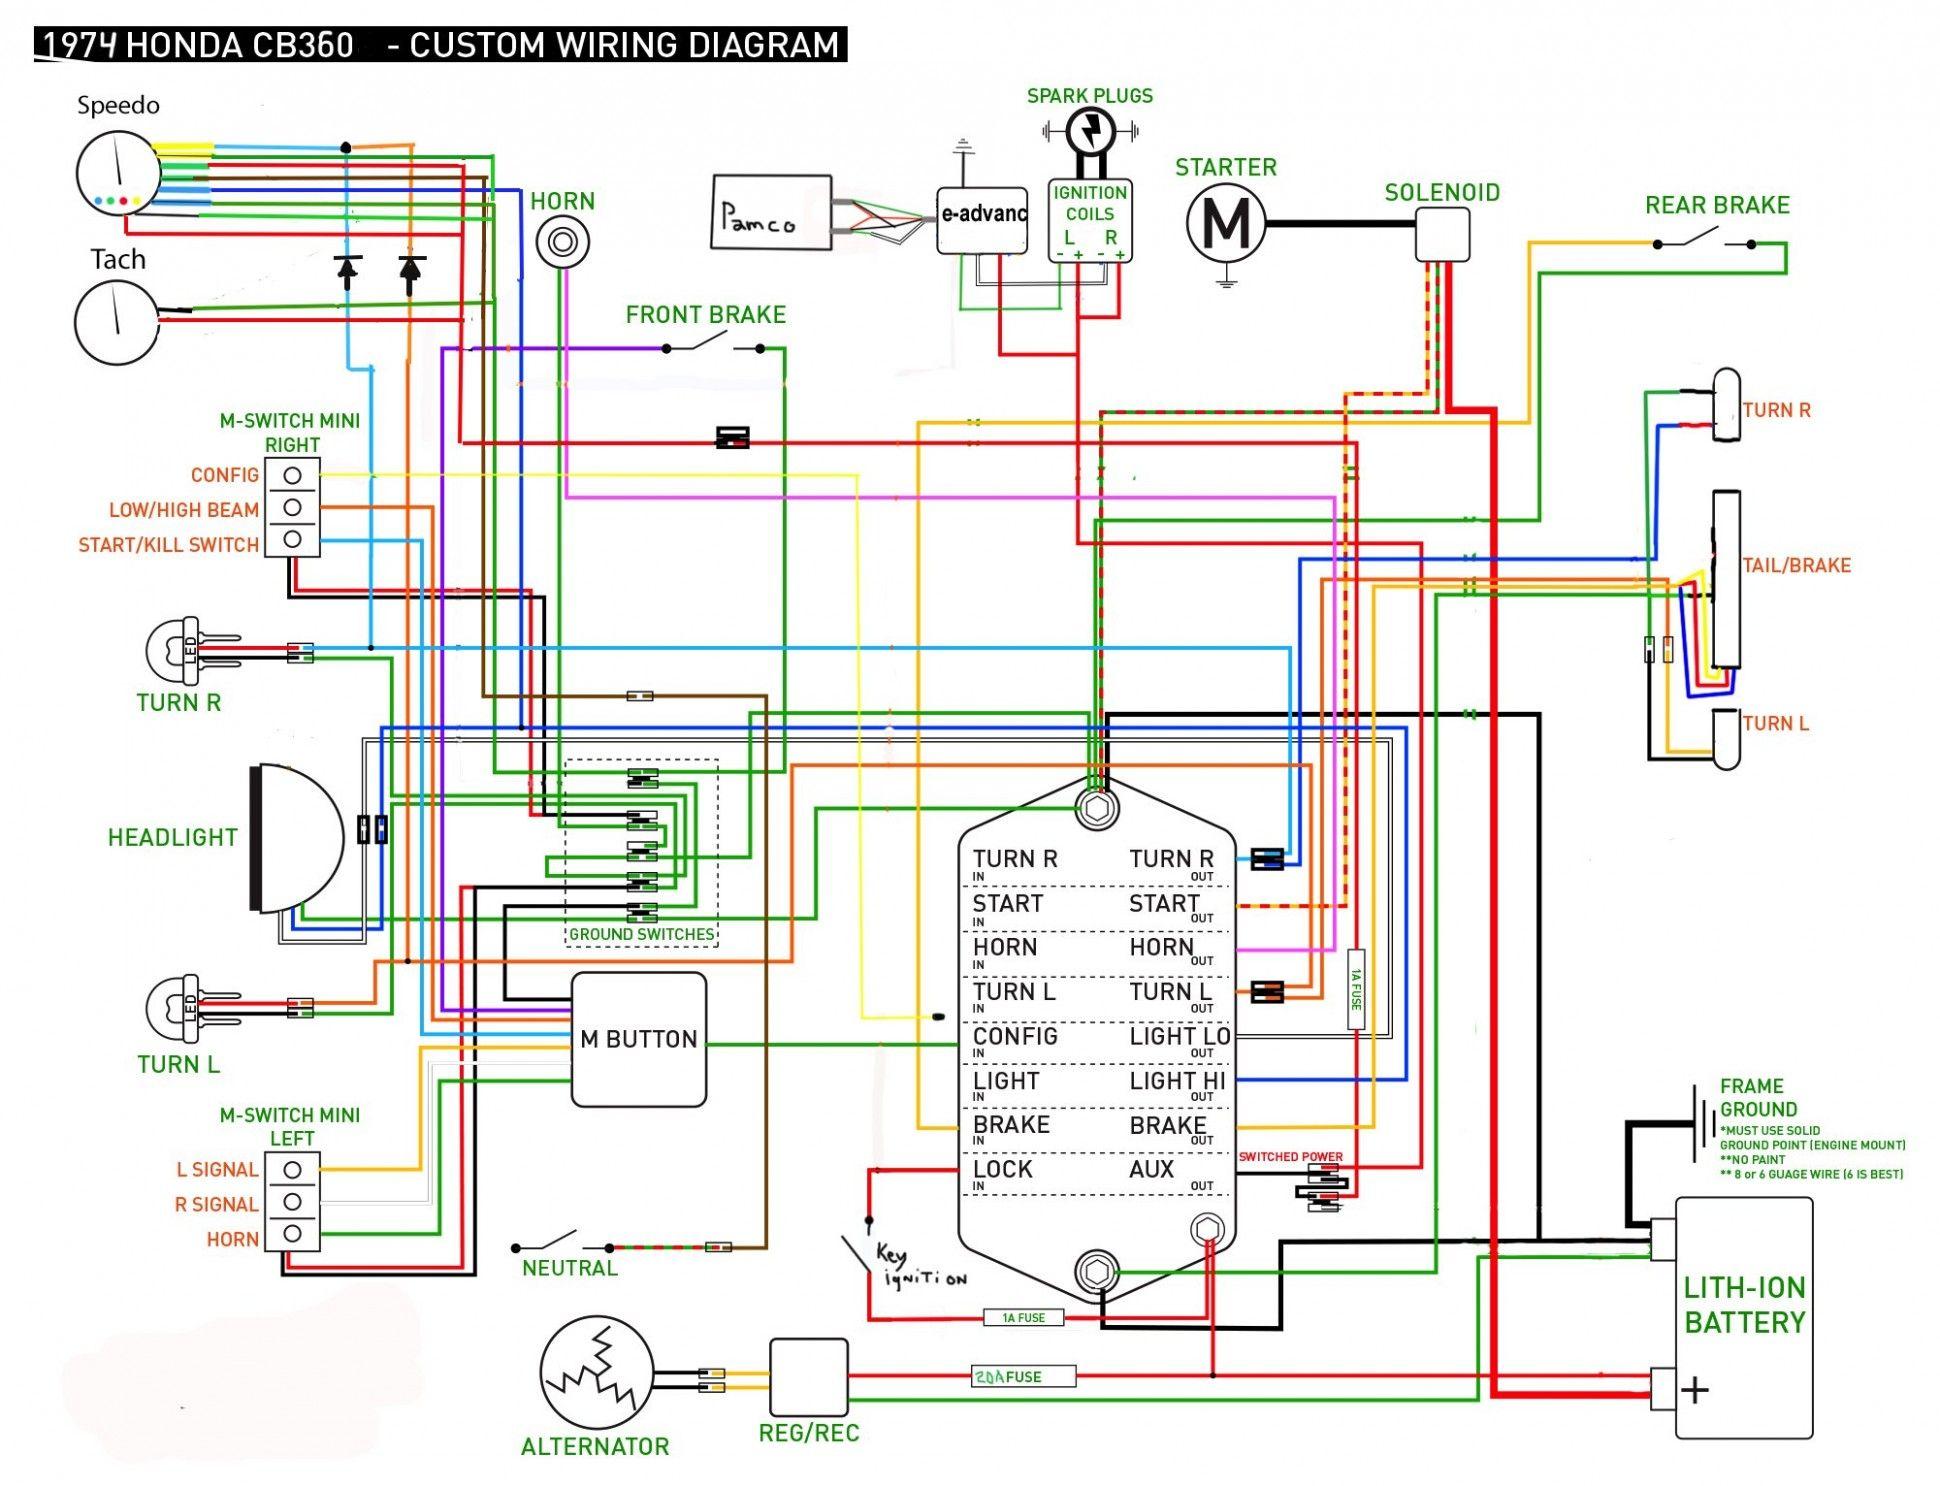 Engine Ground Diagram Honda